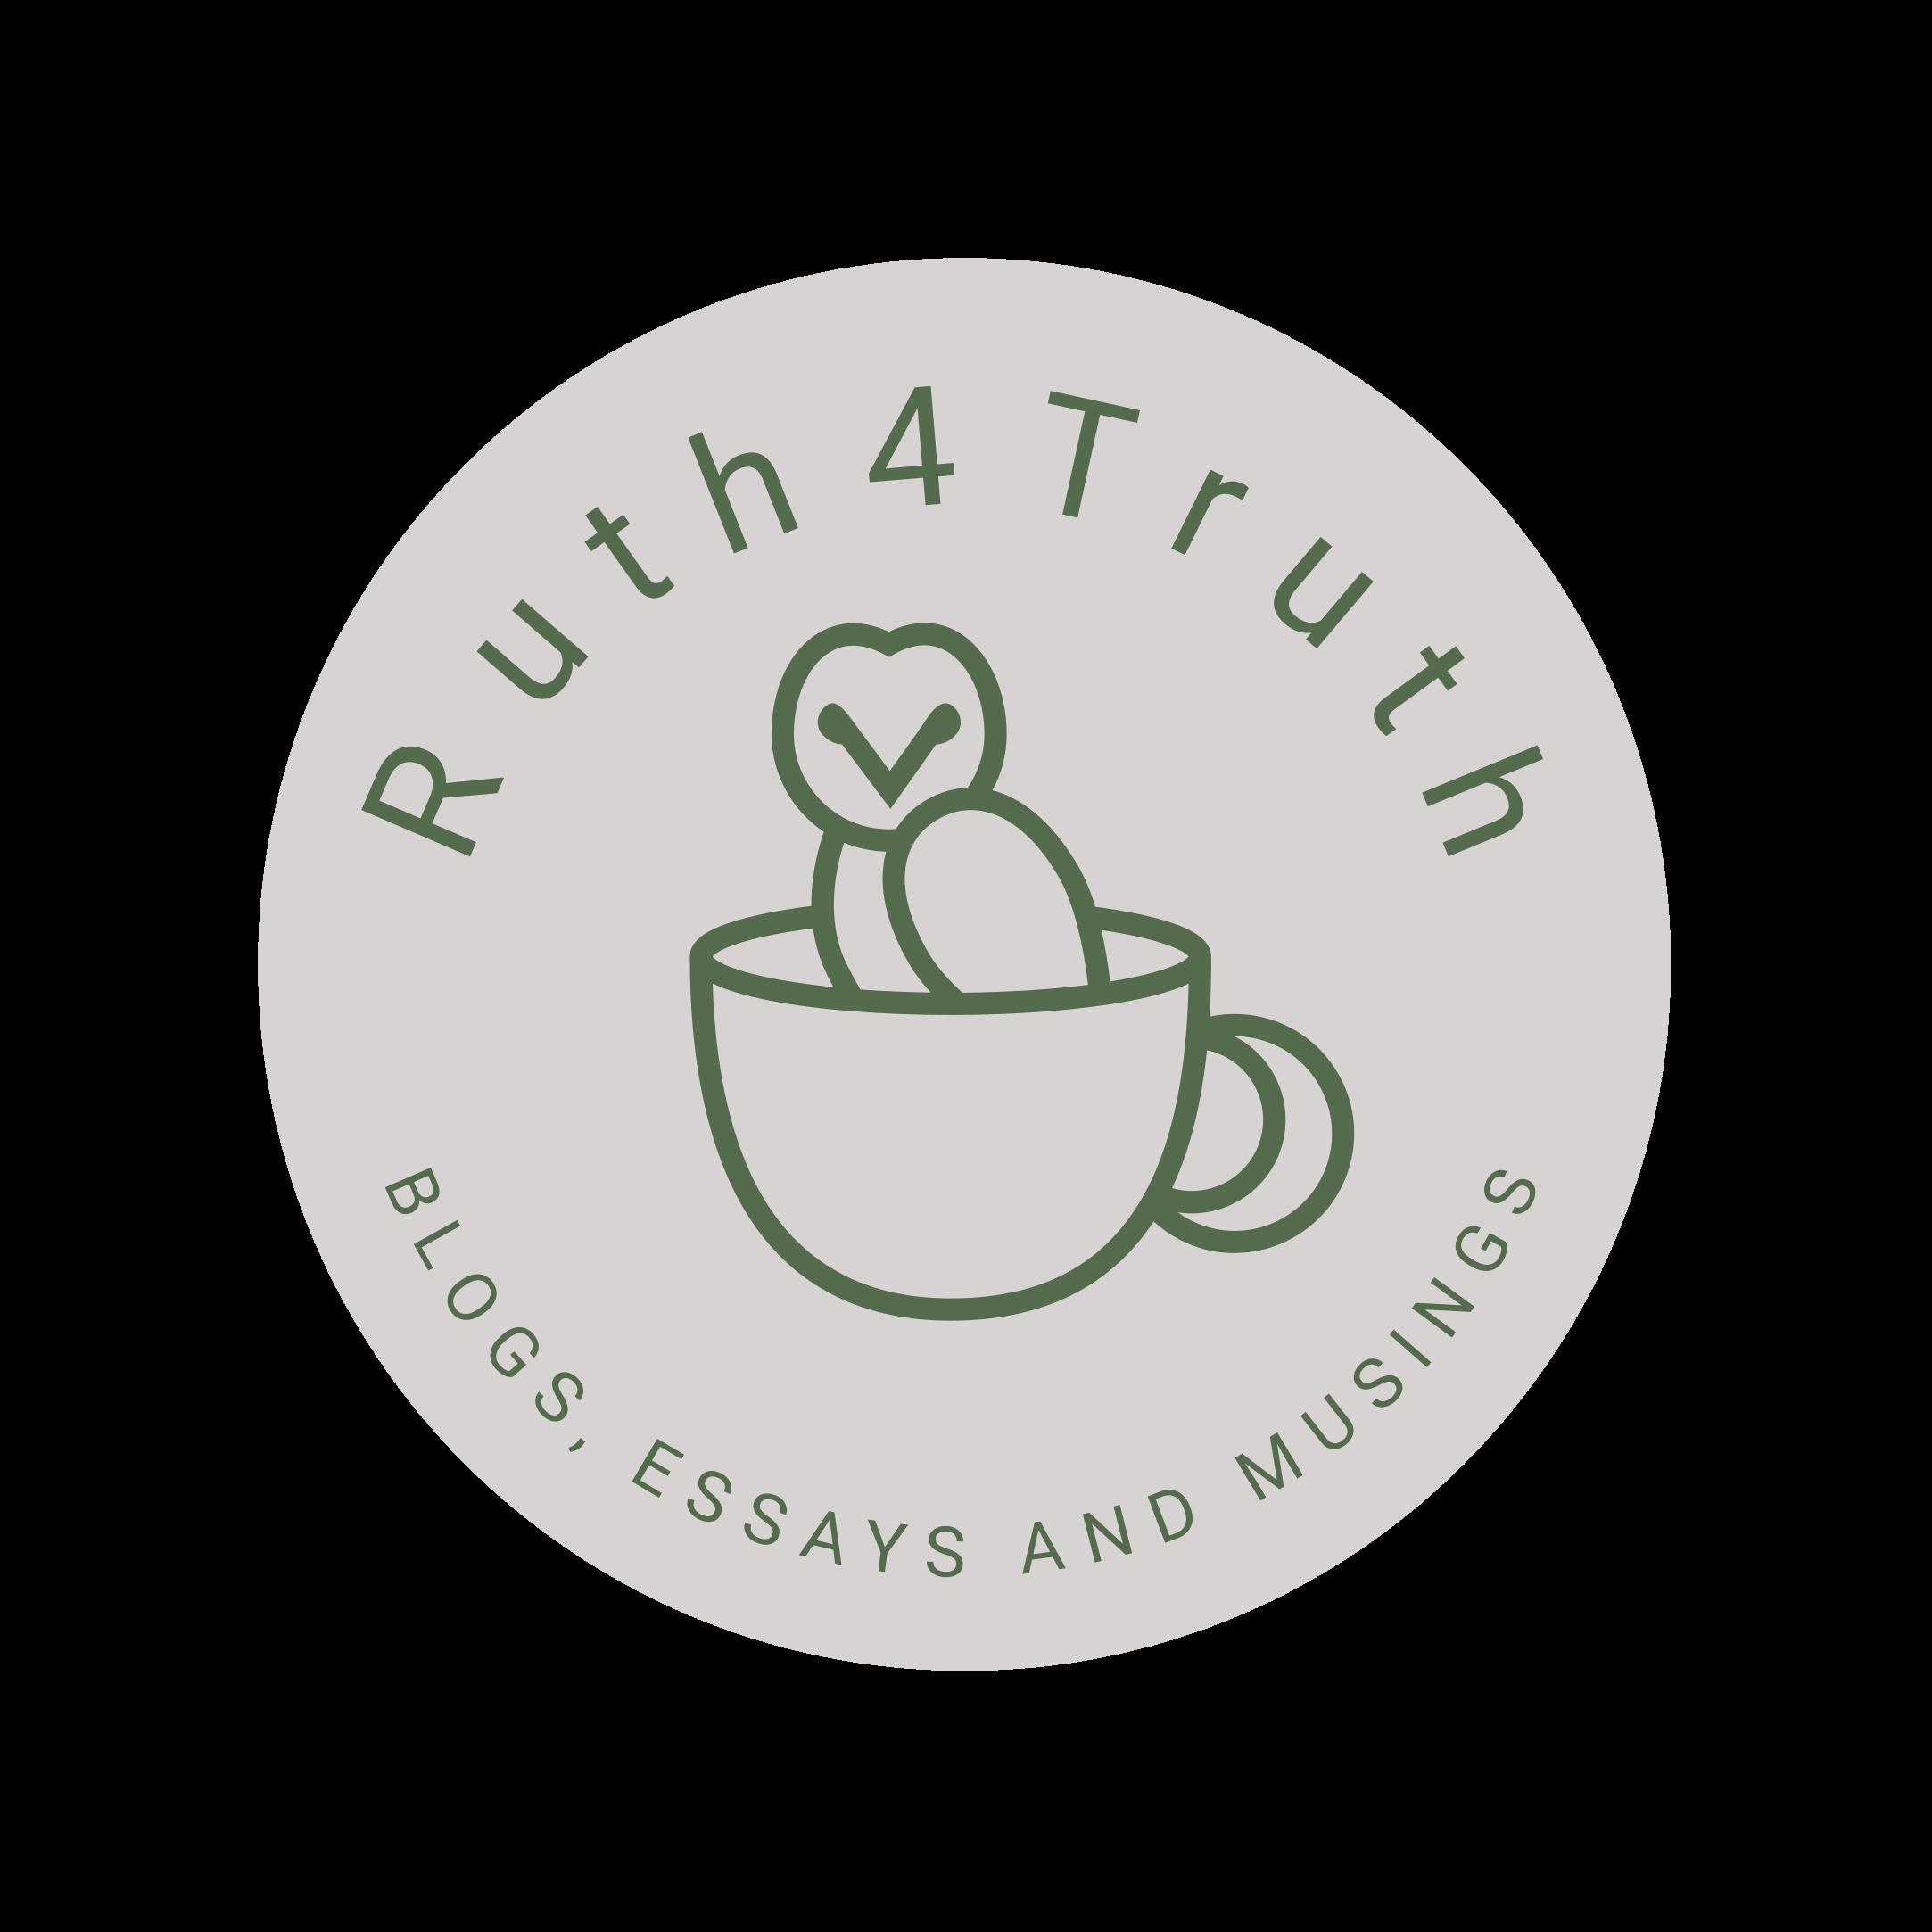 Ruth4Truth